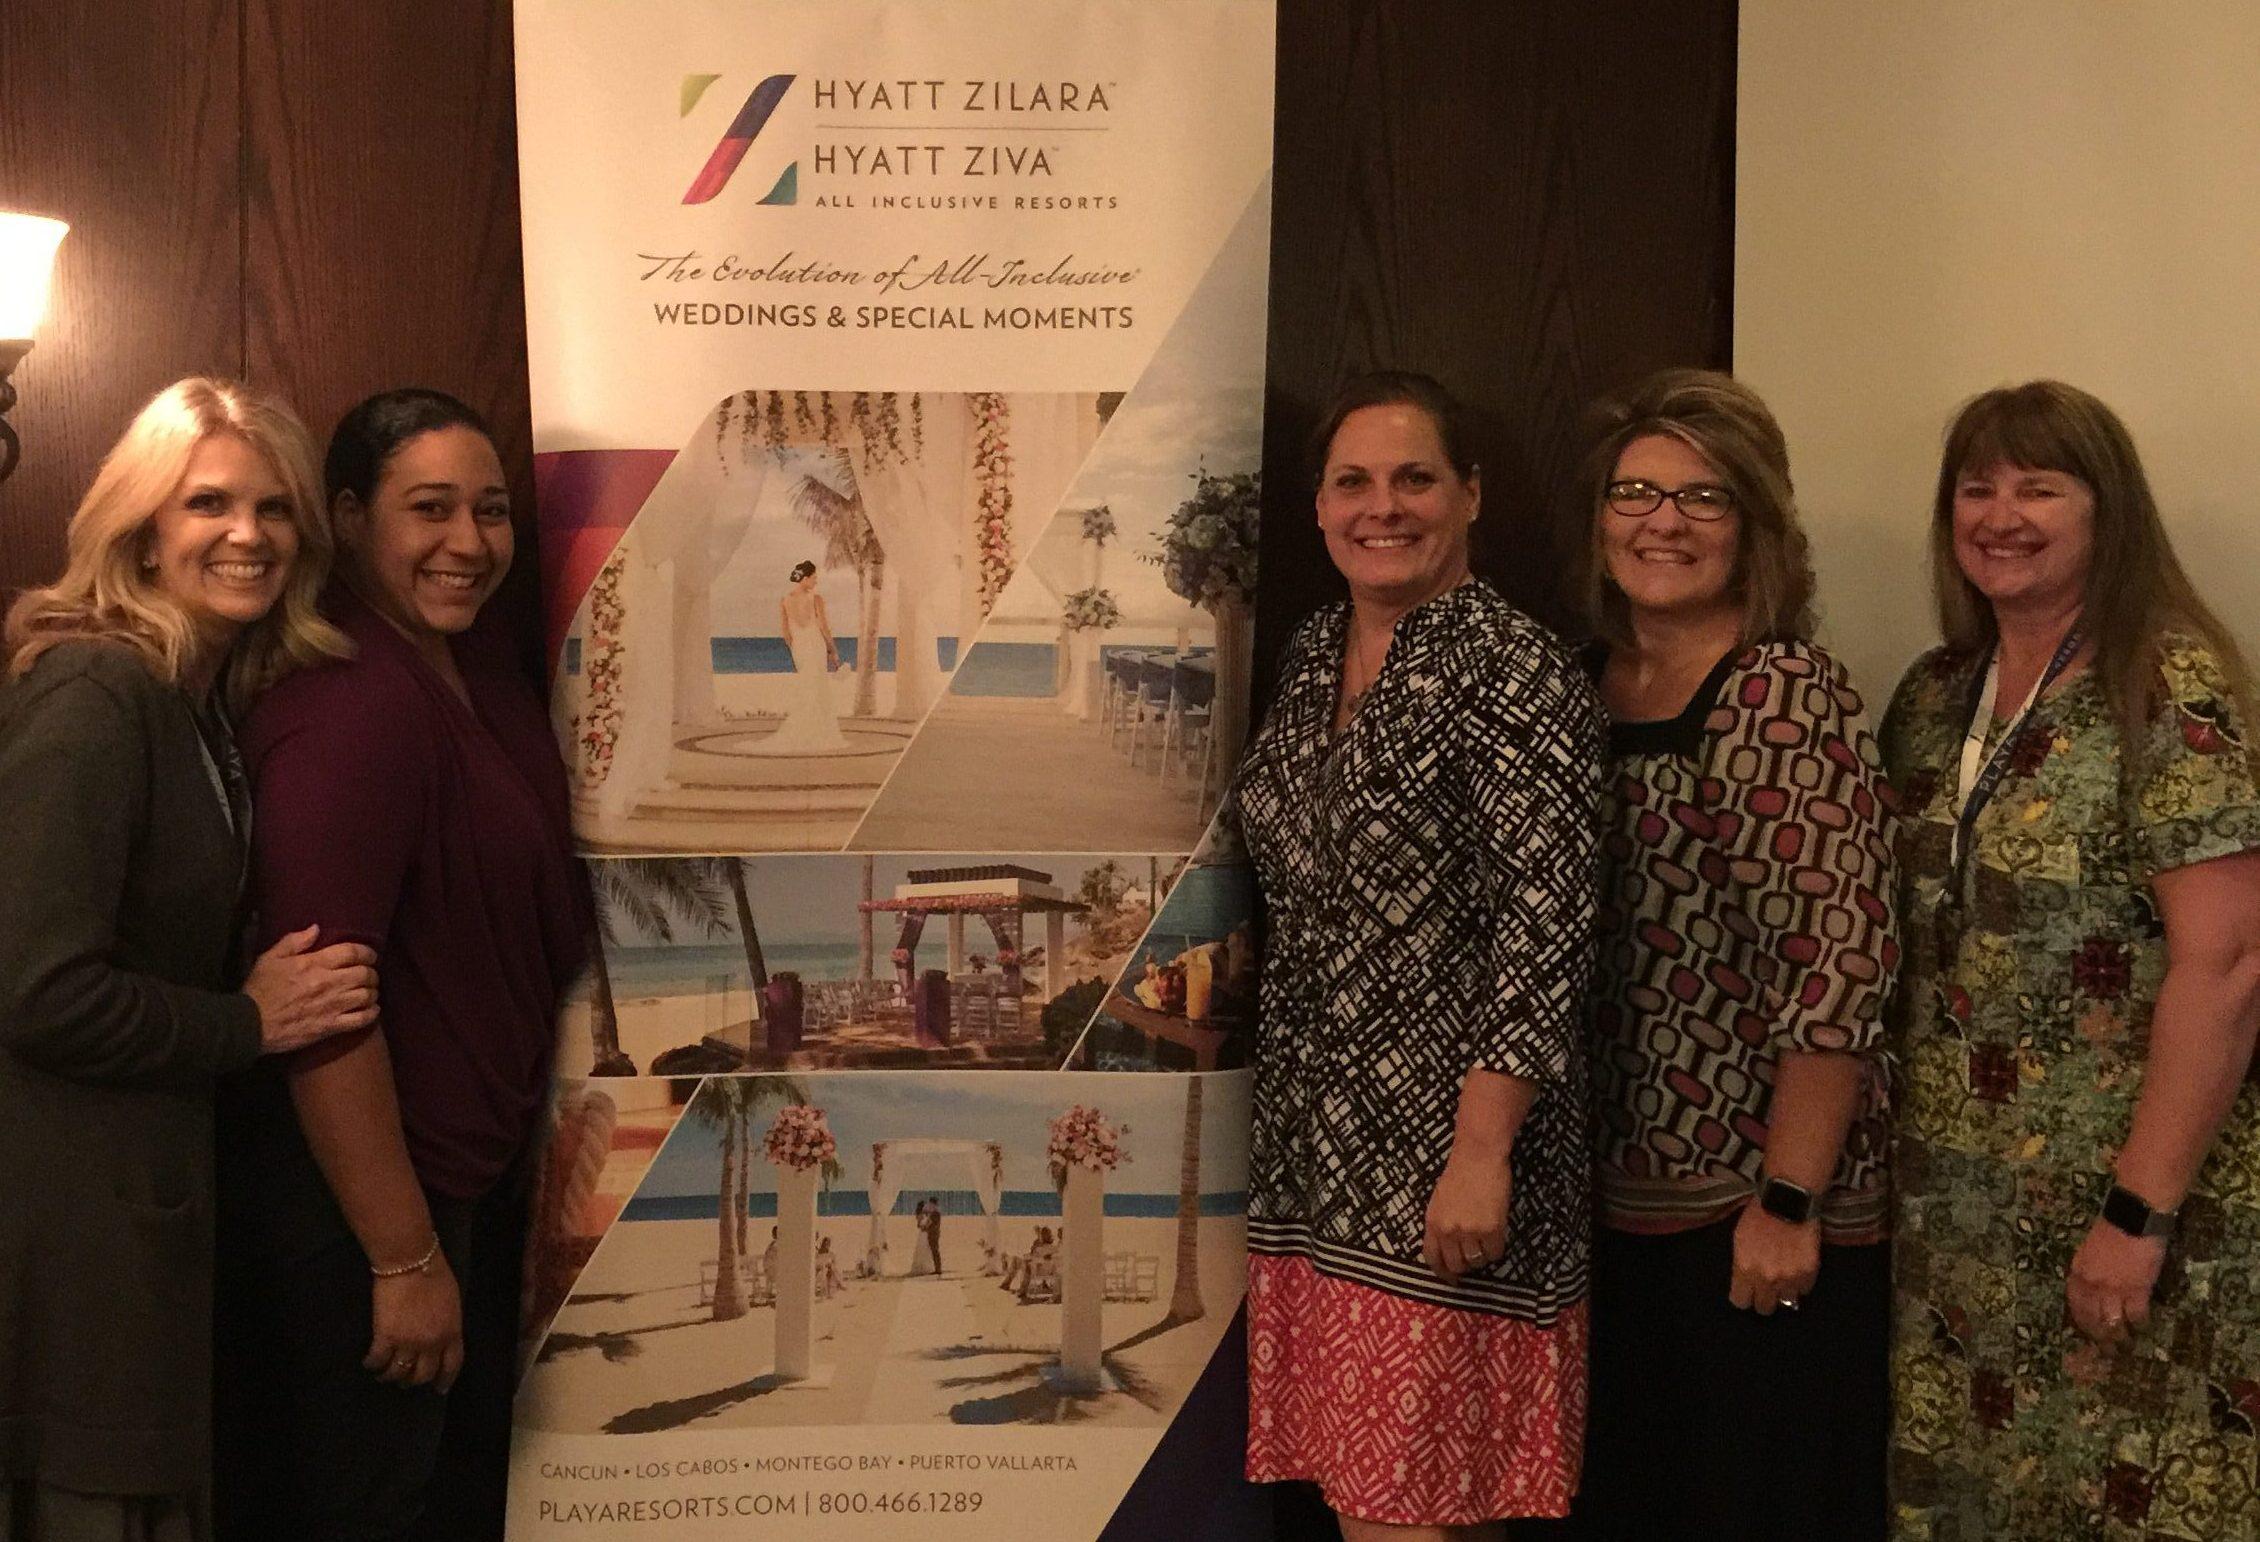 Hyatt & Playa Resorts Training